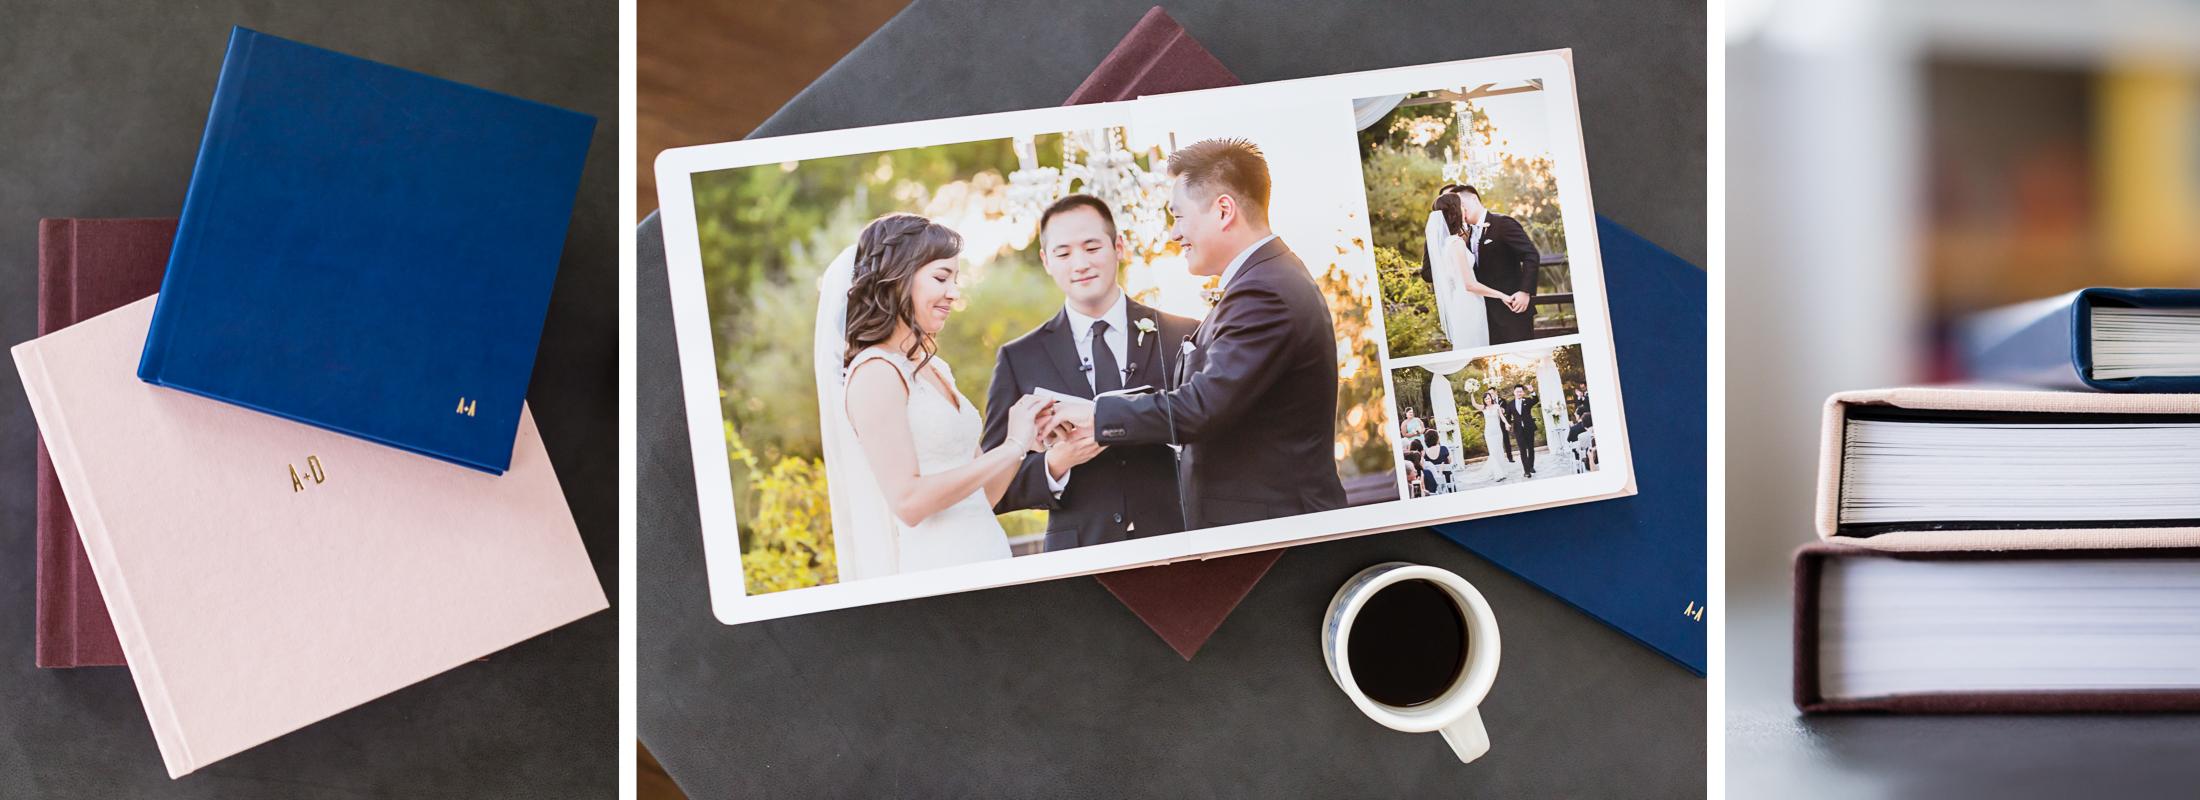 twofish-wedding-photo-albums.jpg